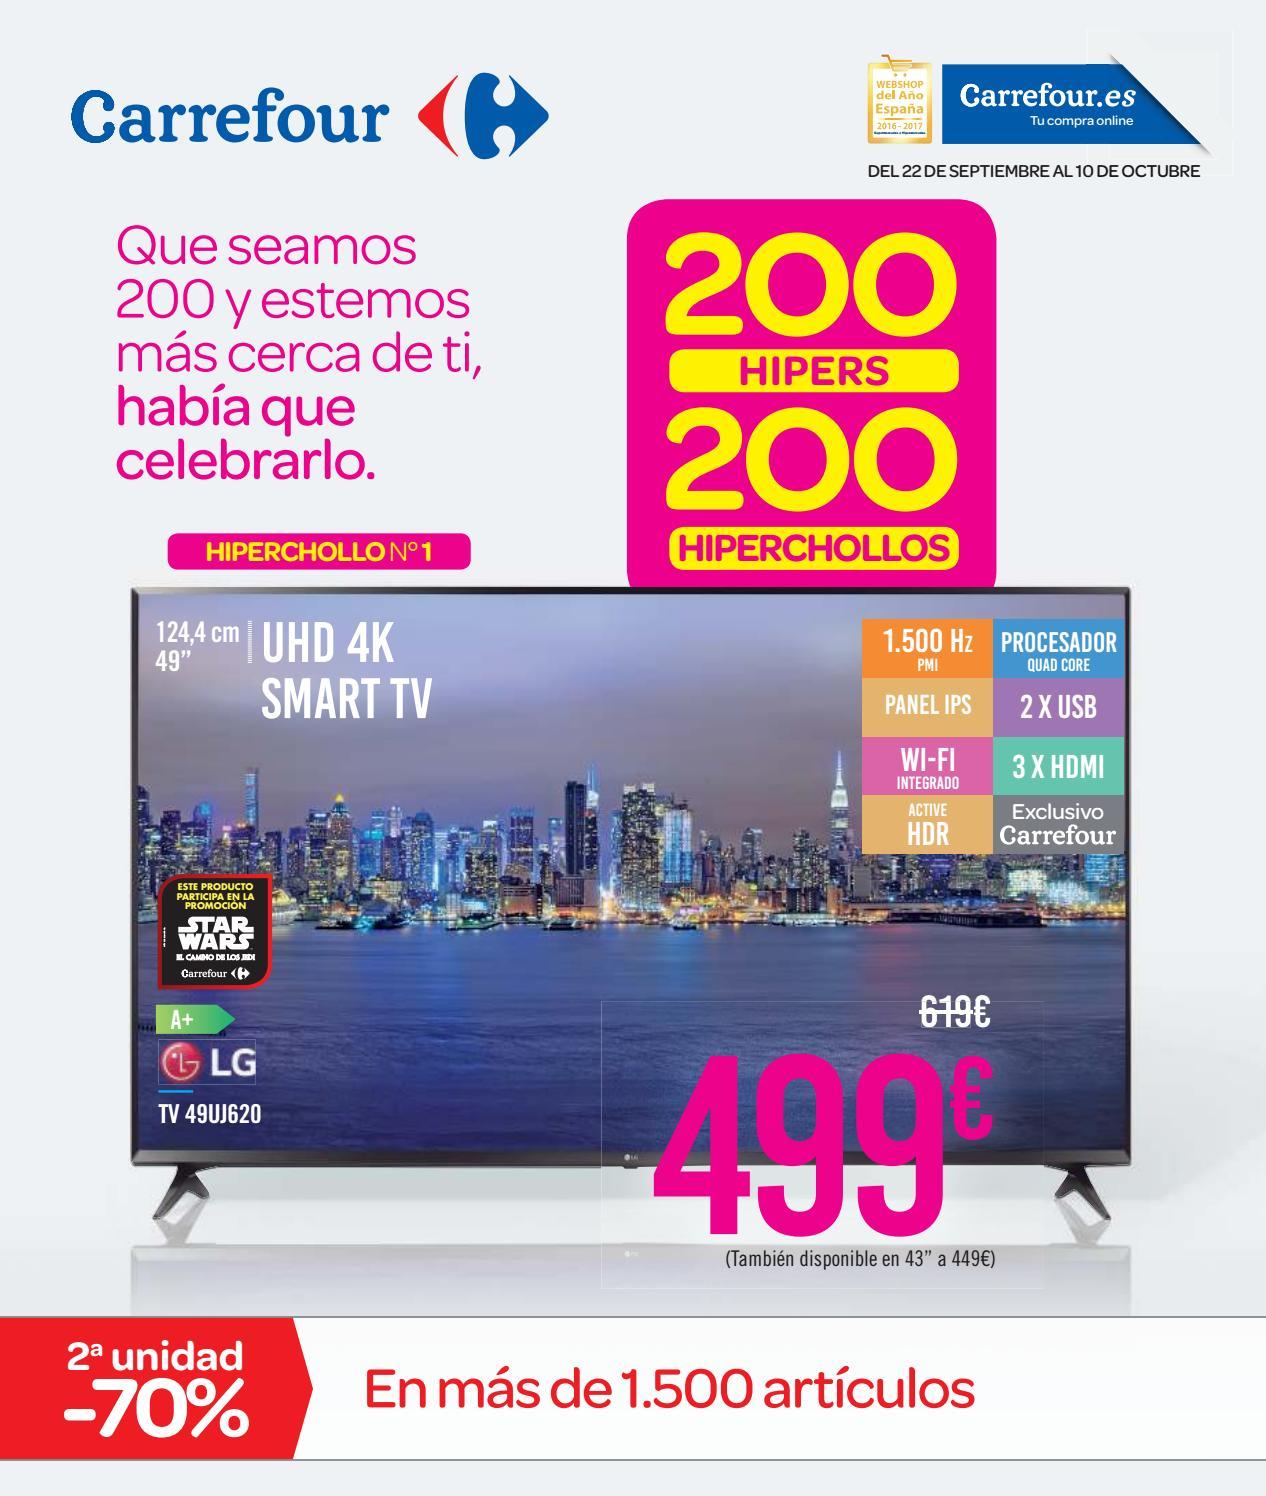 Cat Logo Carrefour 200 Hipers 200 Hiperchollos By Ofertas  ~ Pinzas Sujeta Sabanas Carrefour